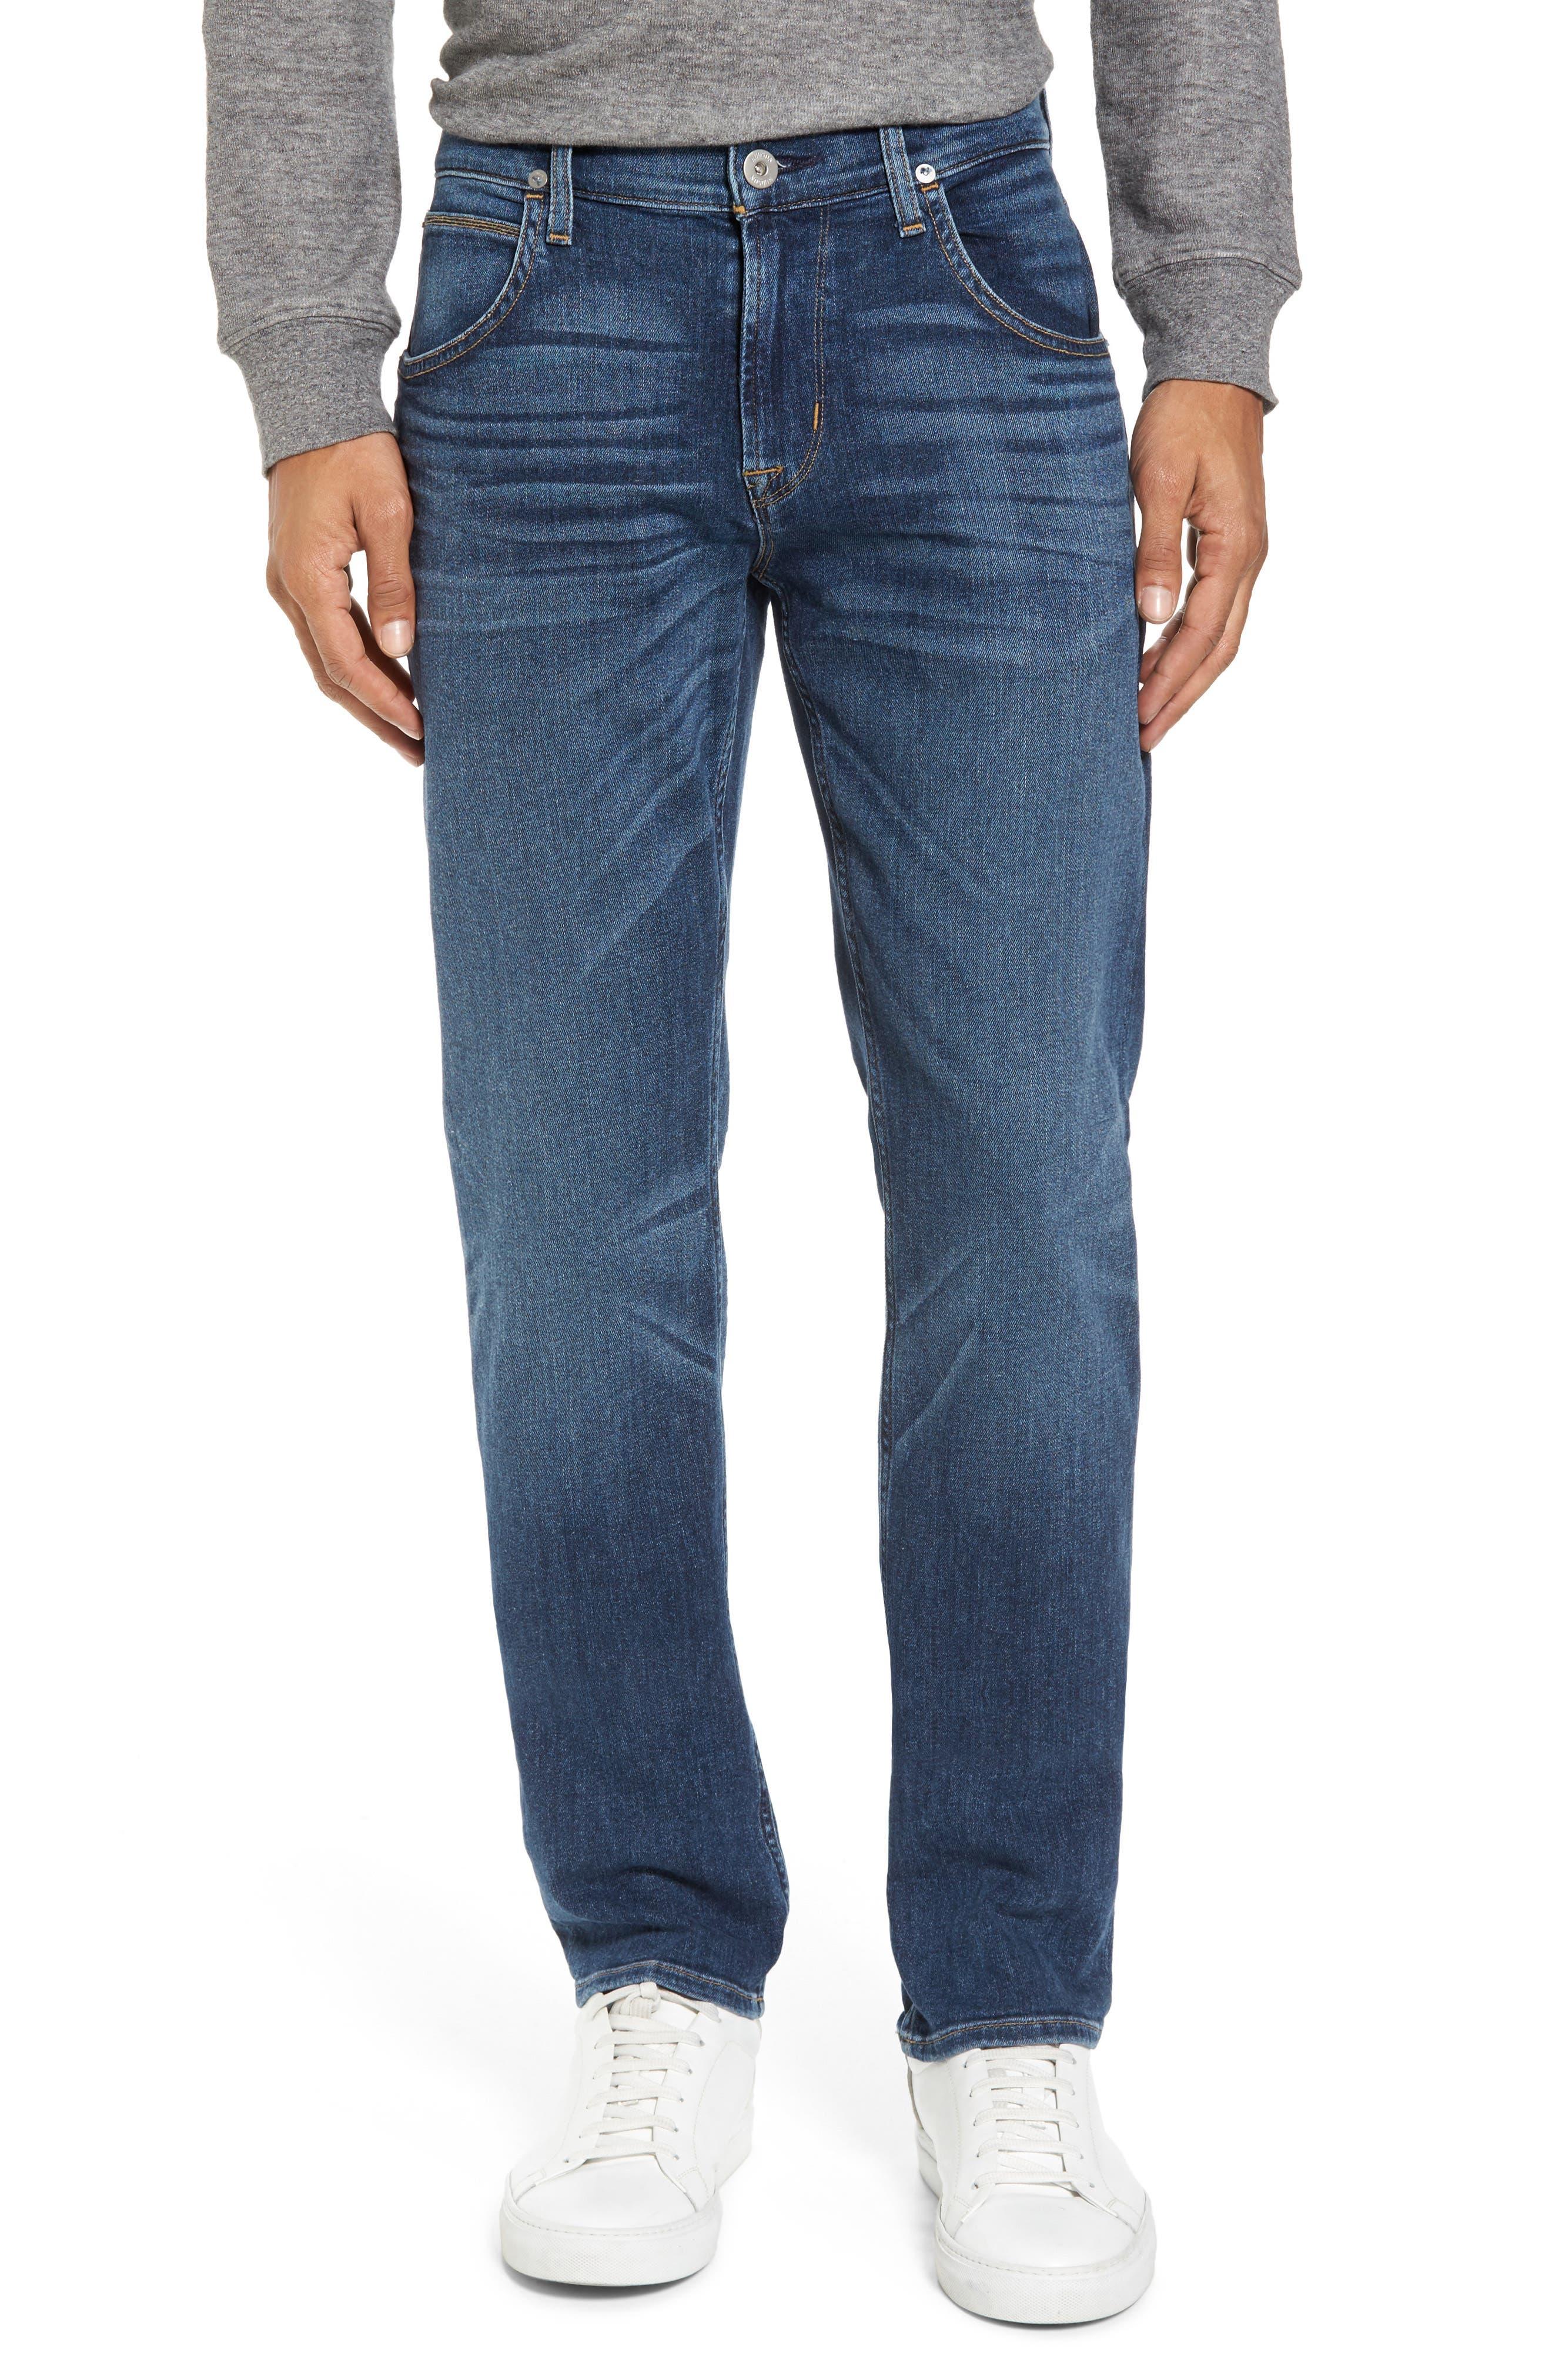 Blake Slim Fit Jeans,                         Main,                         color, Calloway